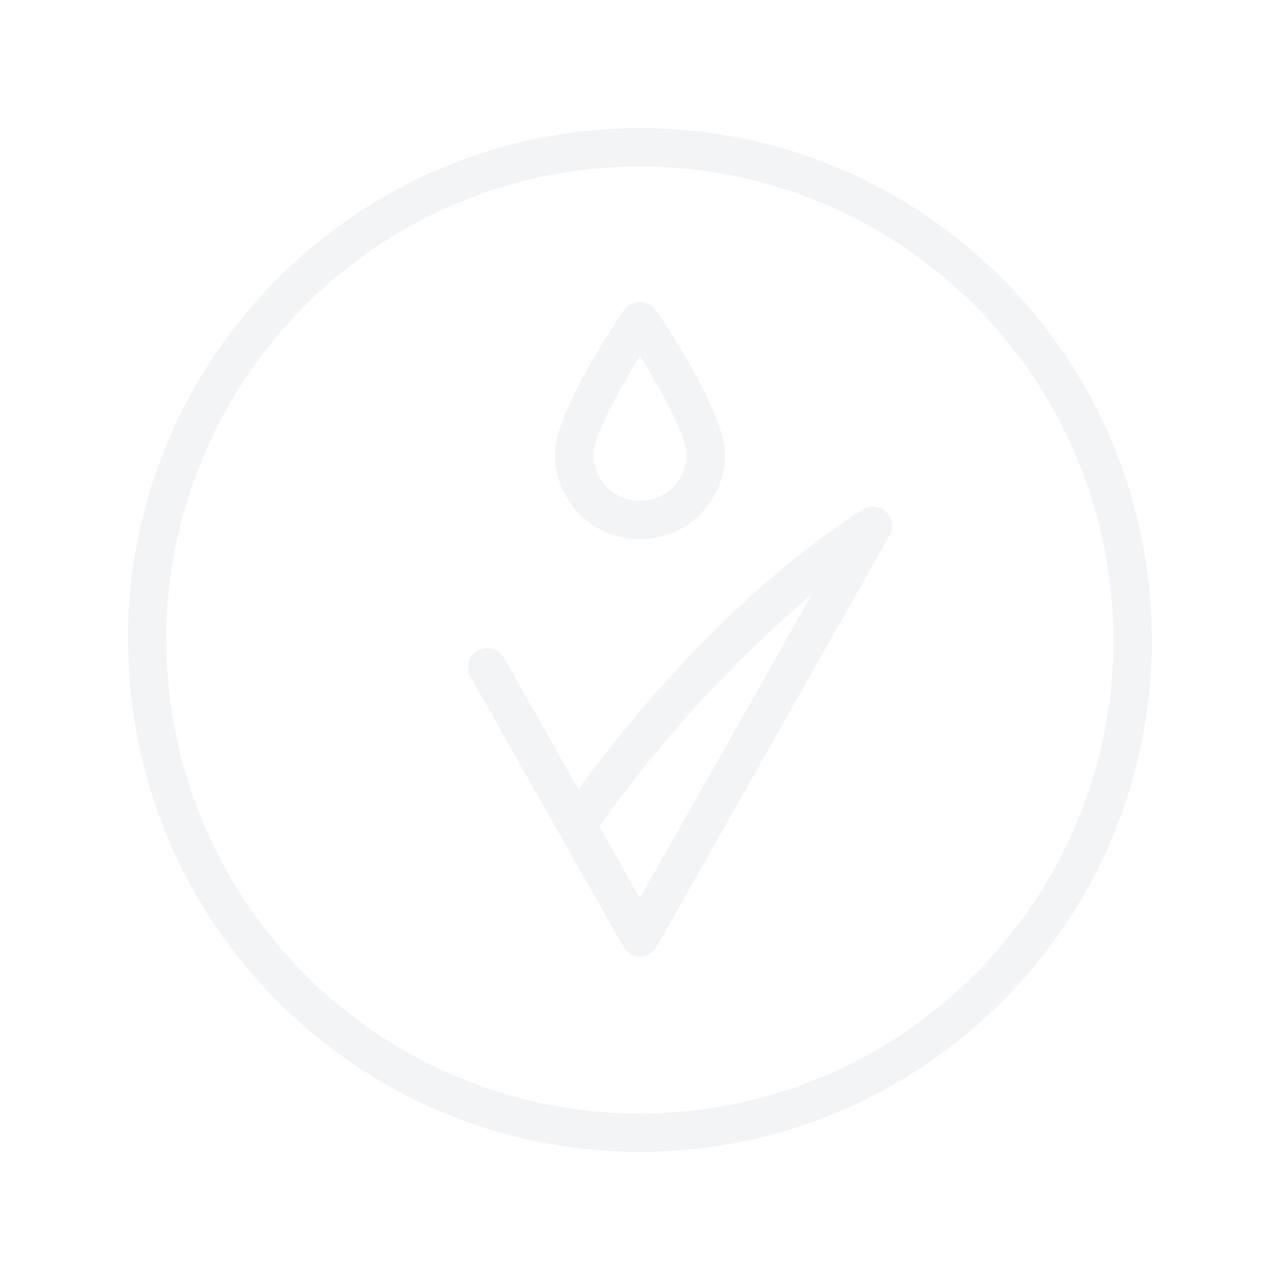 MISSHA Pure Source Cell Lemon Sheet Mask 21g